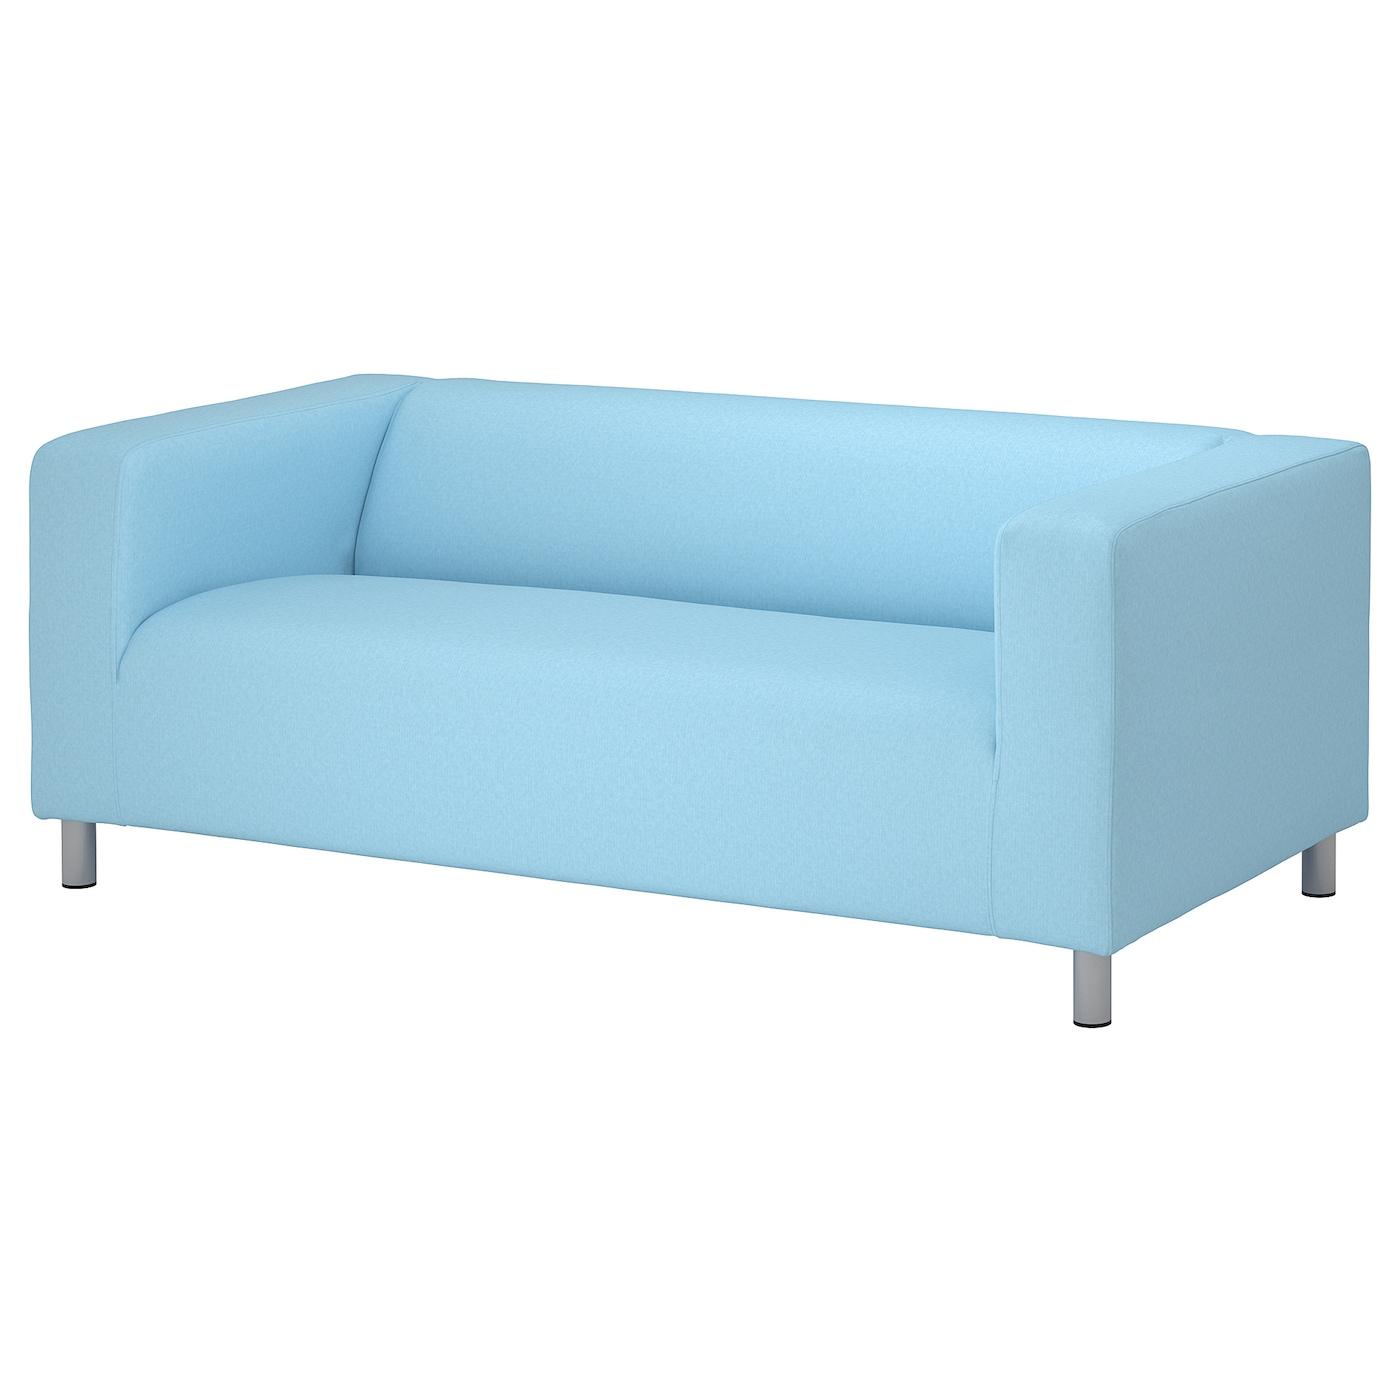 IKEA KLIPPAN Sofa 2-osobowa, Vissle jasnoniebieski